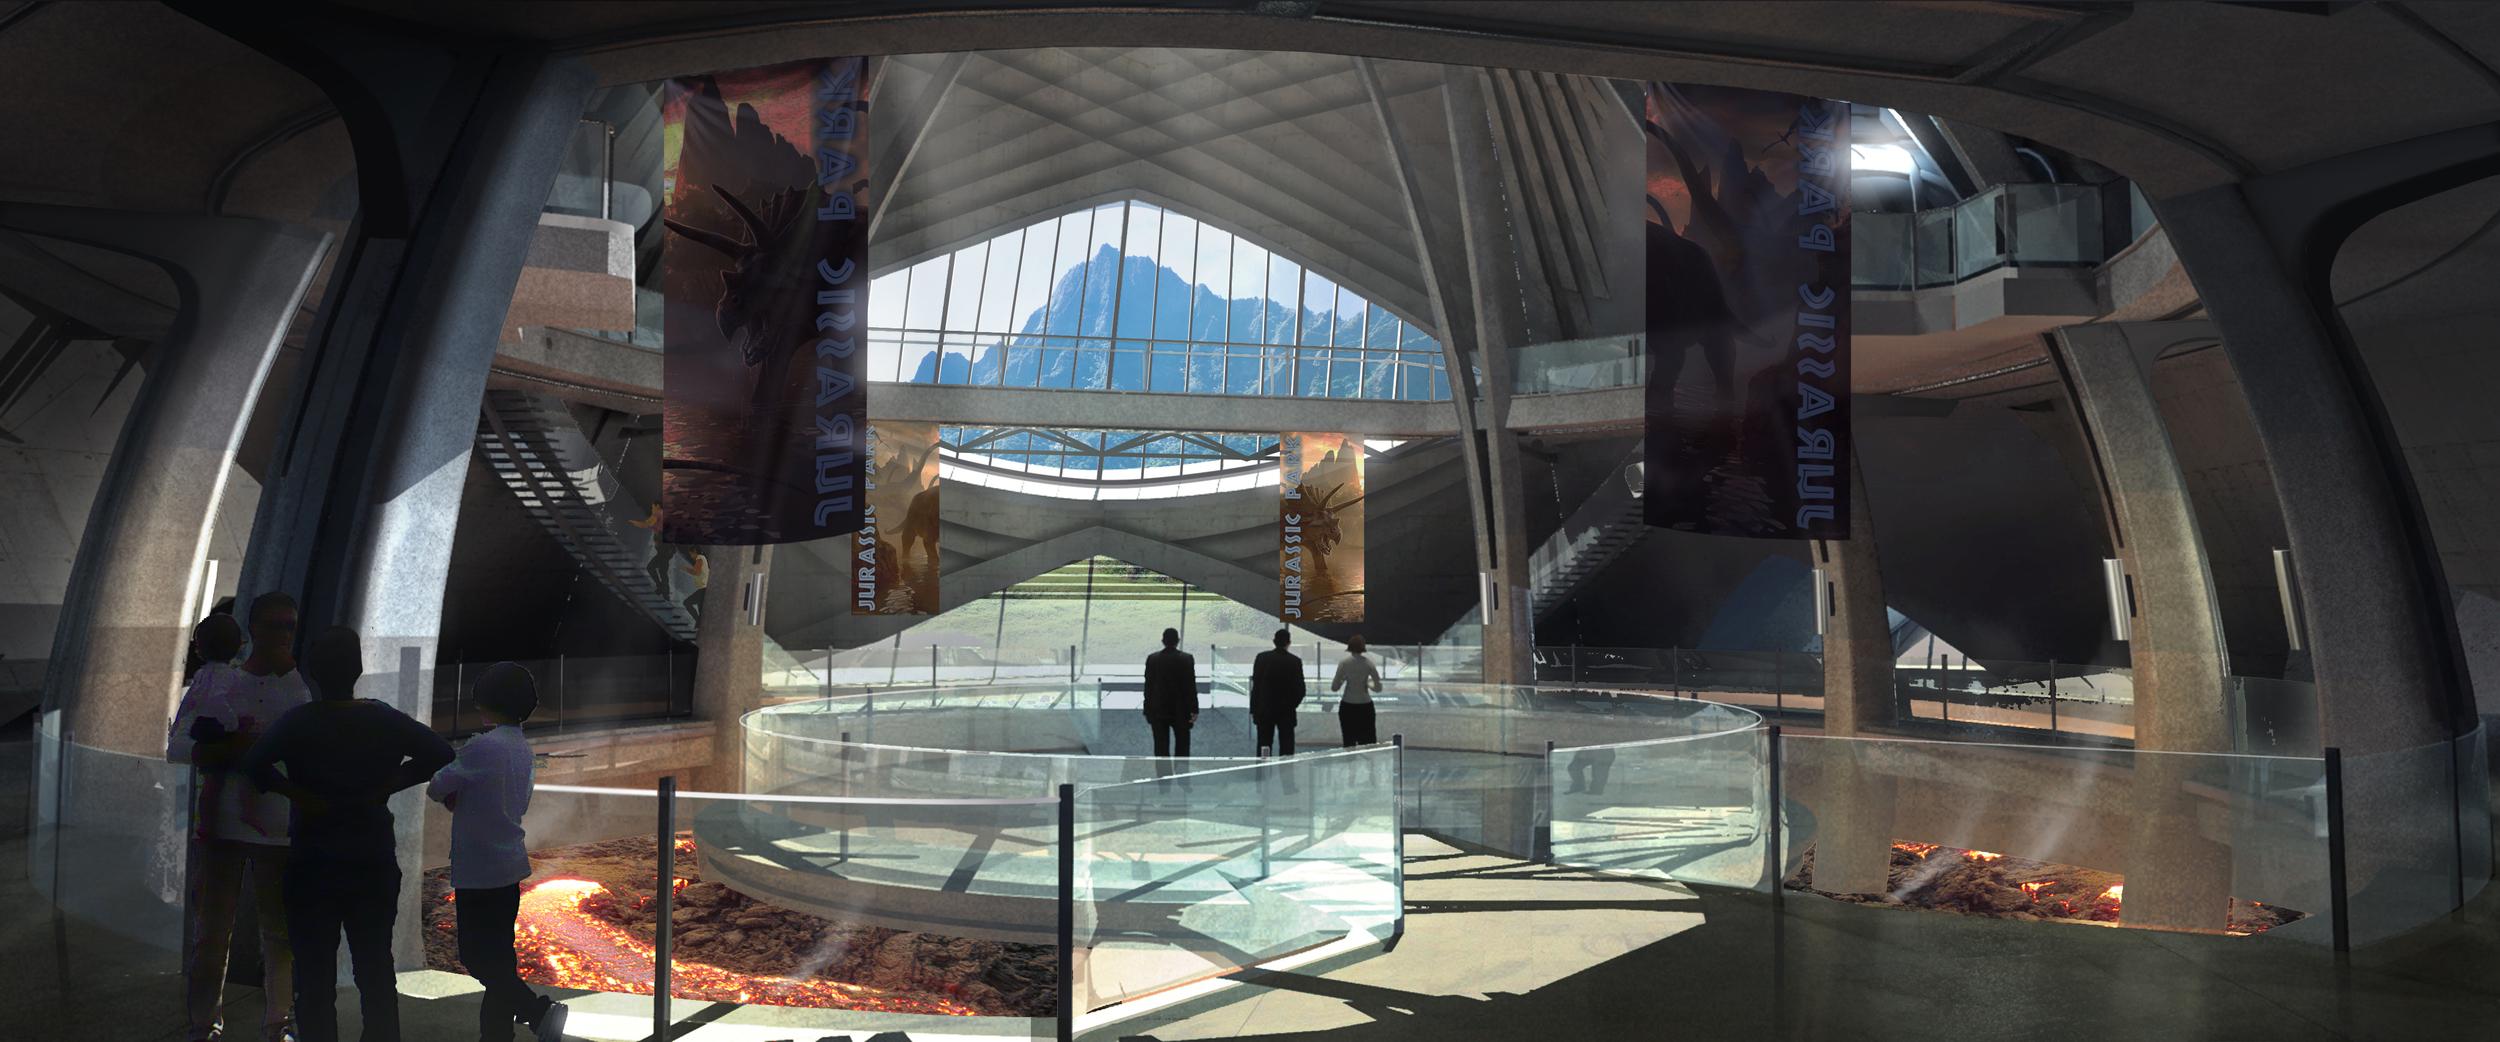 interior-visitor's_f pass 01.jpg